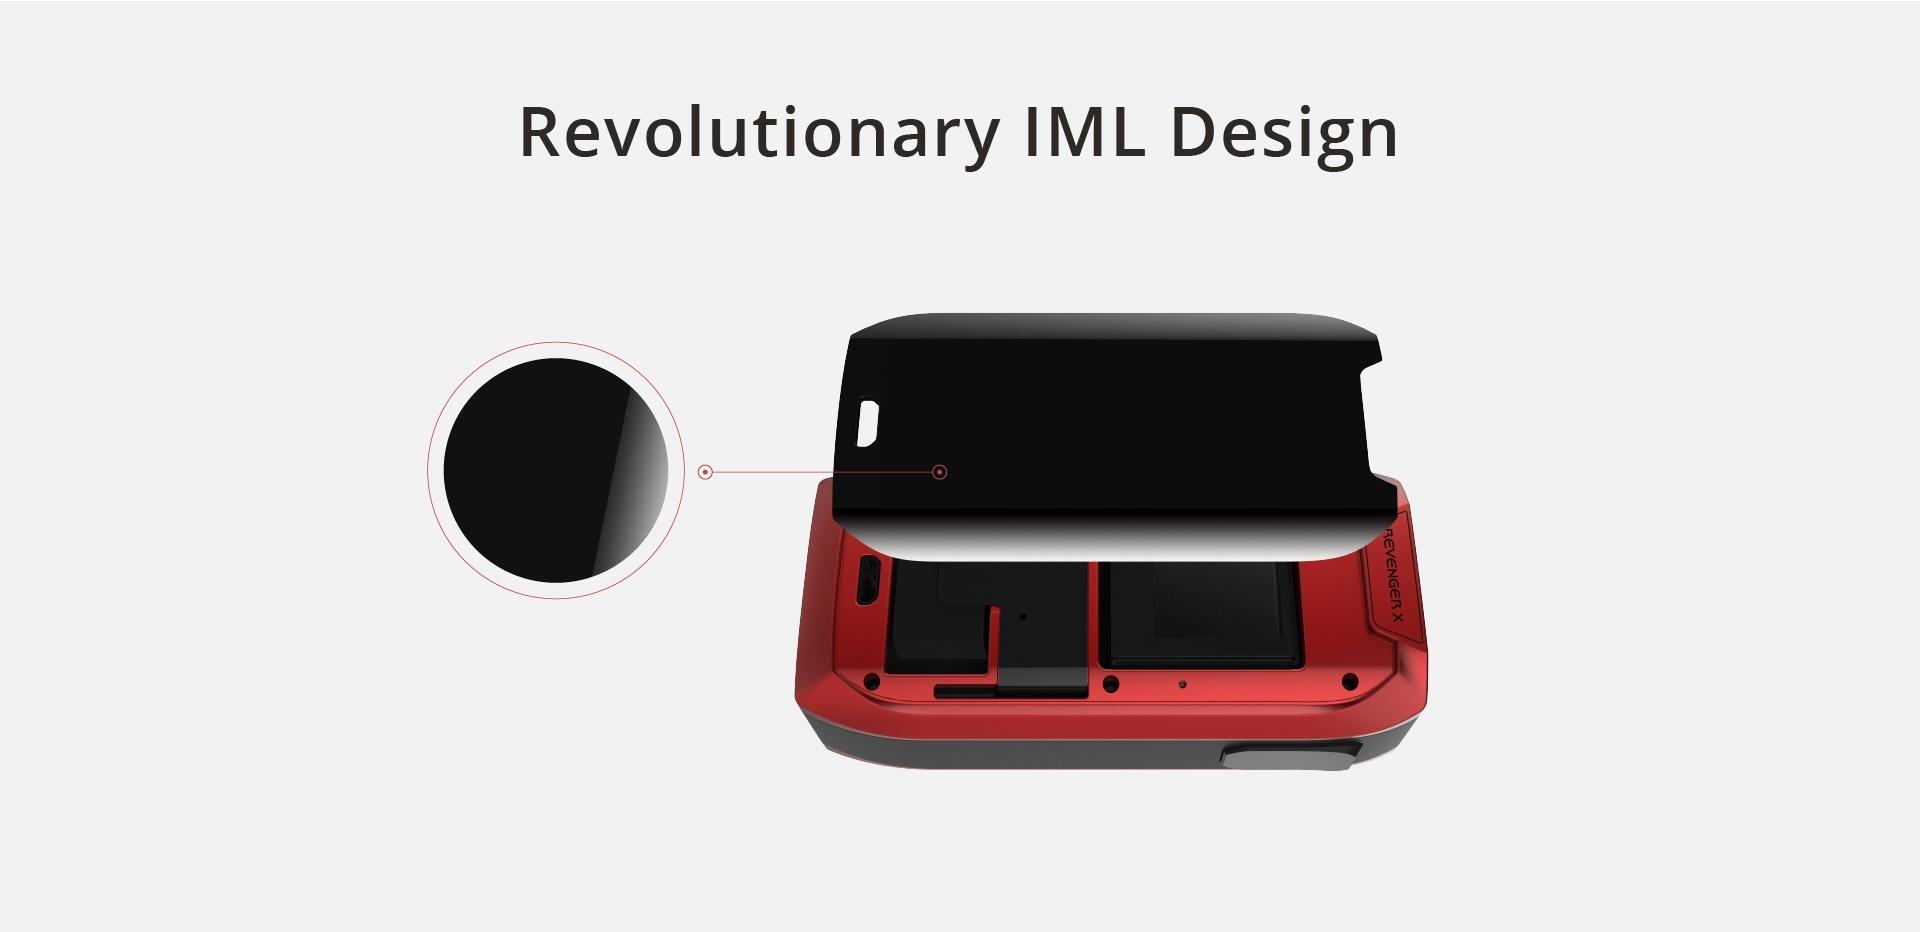 Vaporesso IML design